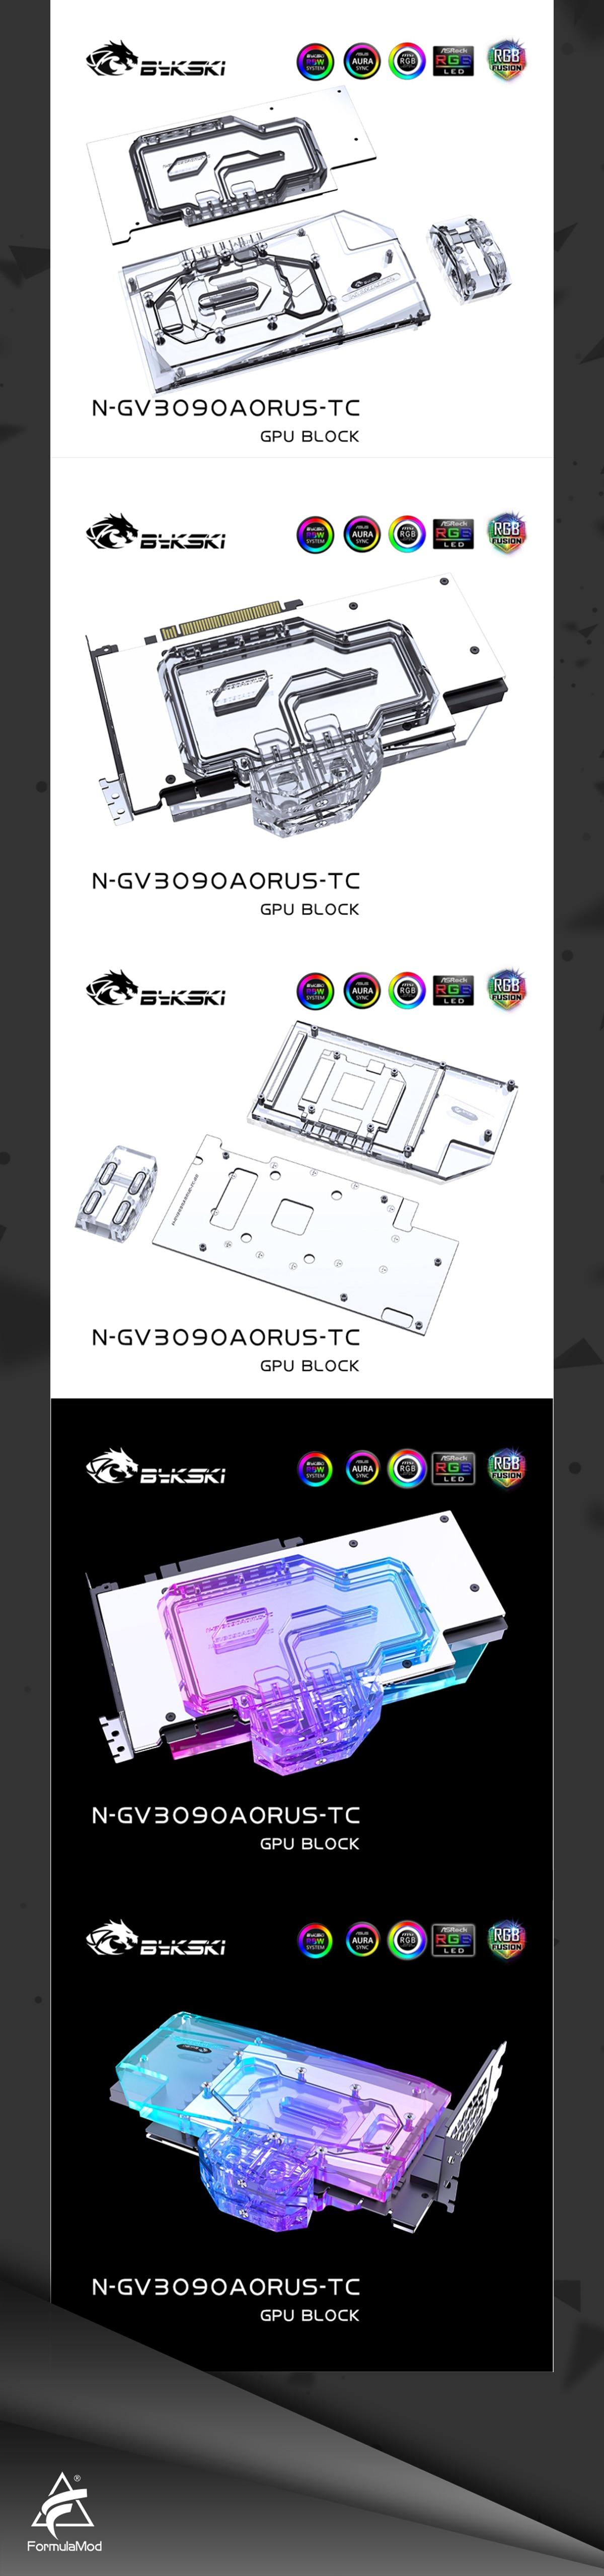 Bykski GPU Block With Active Waterway Backplane Water Cooling Cooler For GiGabyte RTX 3090 3080 Aorus Master N-GV3090AORUS-TC